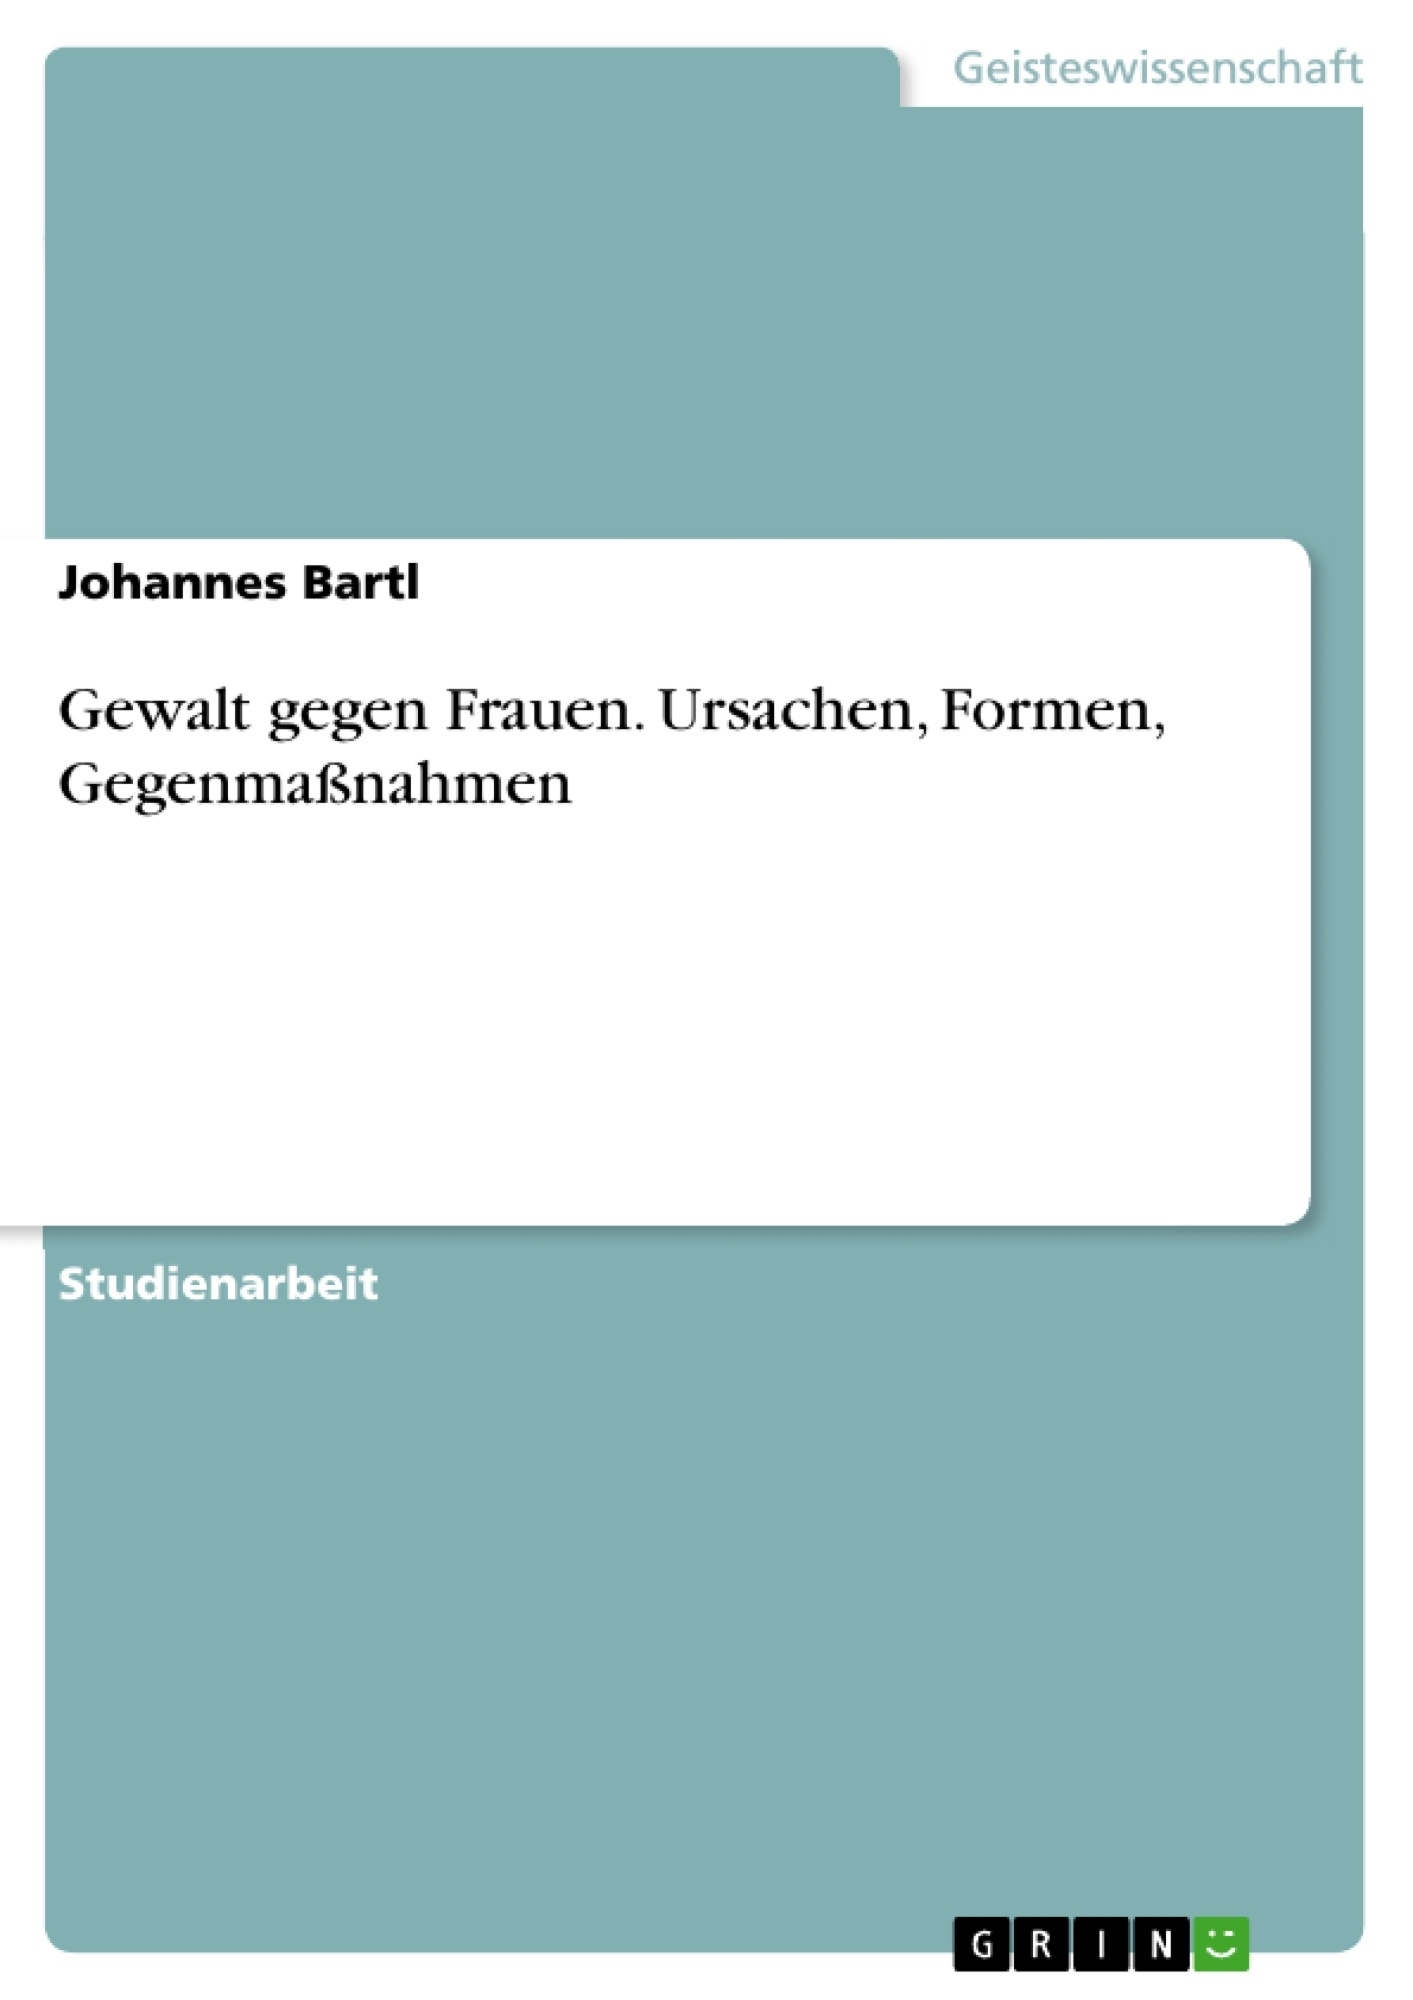 Titel: Gewalt gegen Frauen. Ursachen, Formen, Gegenmaßnahmen